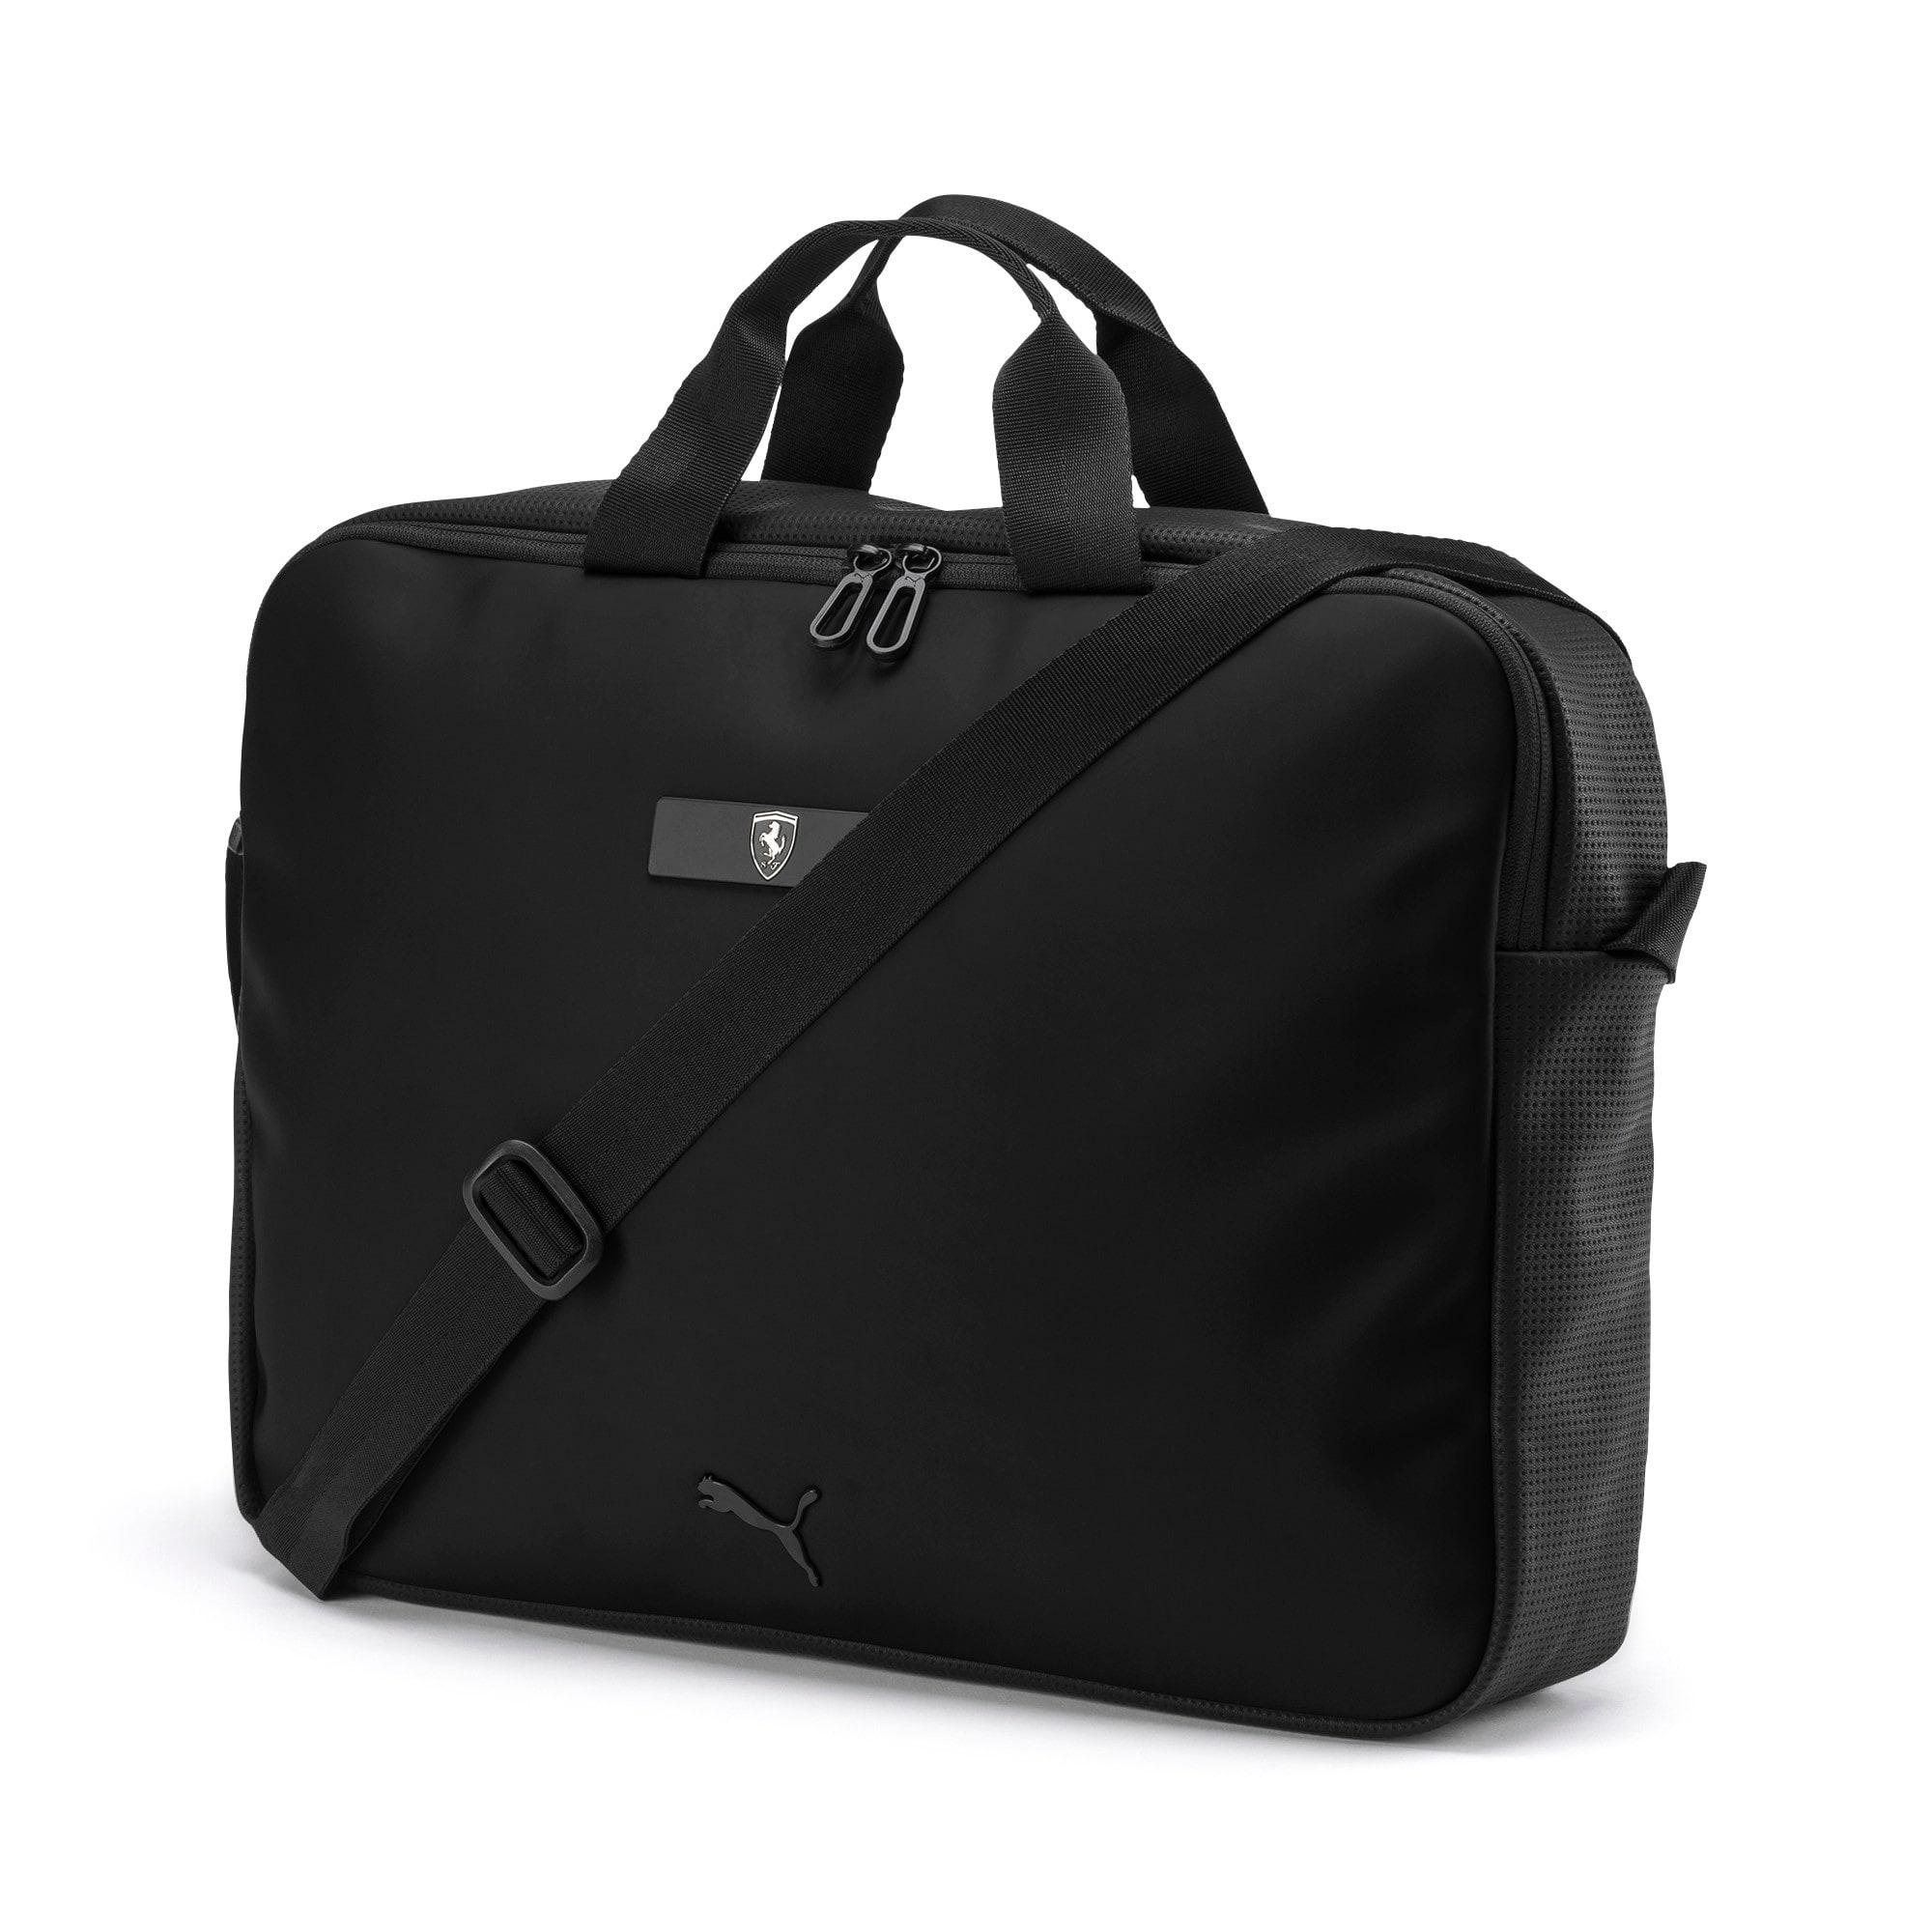 Thumbnail 1 of Ferrari Lifestyle Reporter Bag, Puma Black, medium-IND